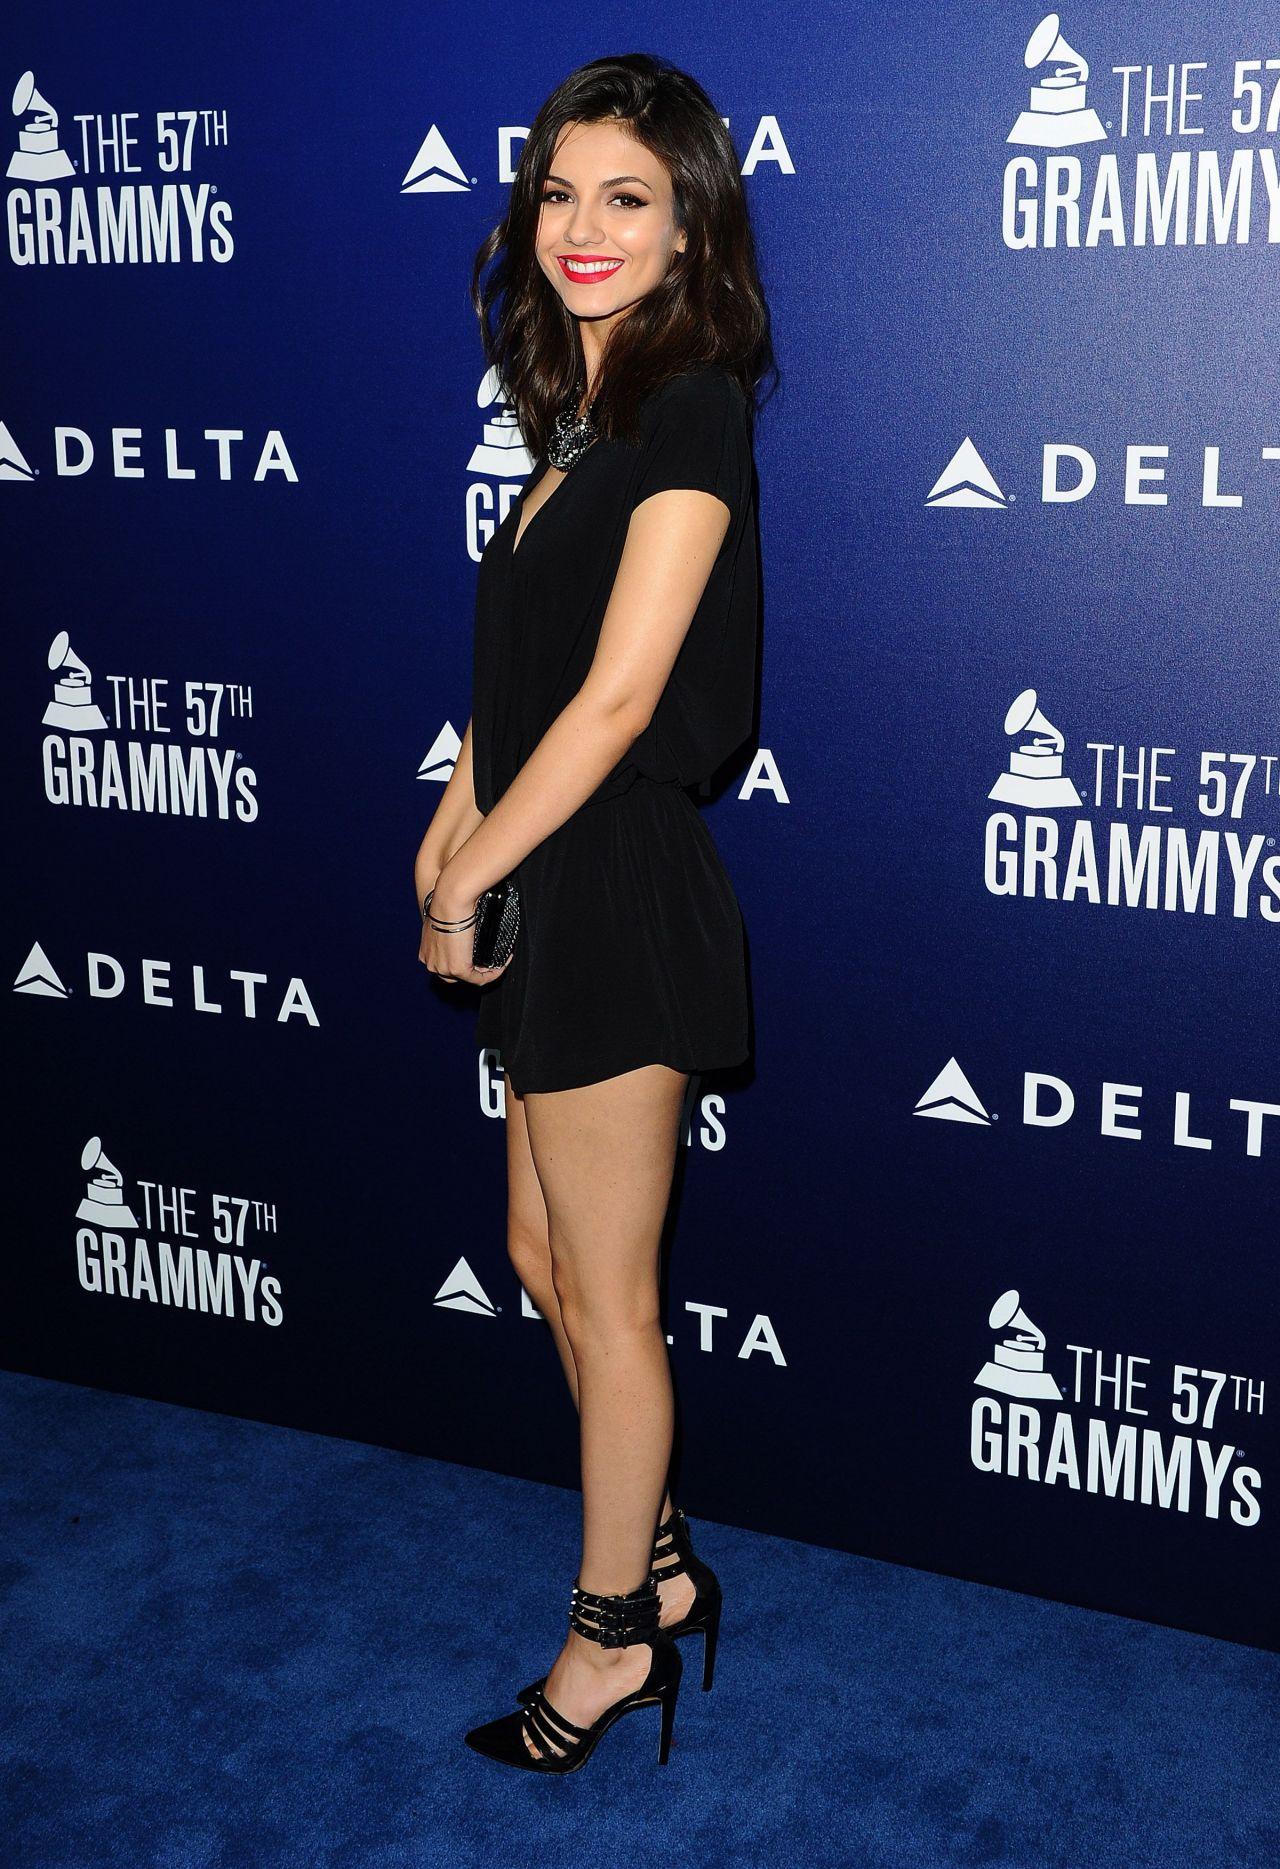 Victoria Justice Delta Air Lines Grammy 2015 Kick Off